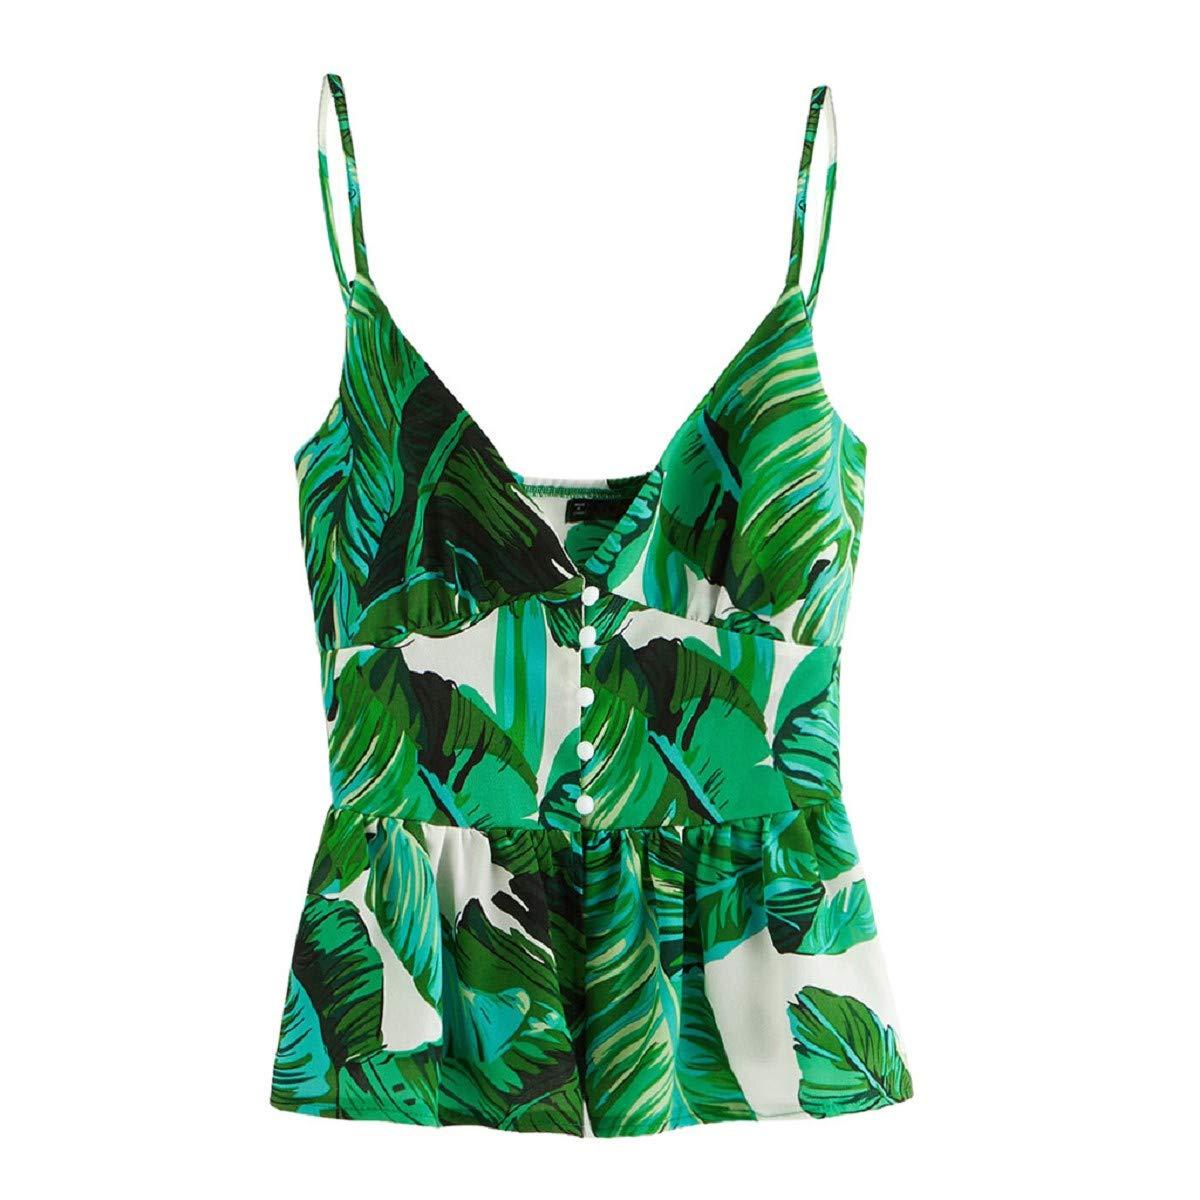 Women's Sexy V Neck Halter Spaghetti Strap Backless Cami Tank Tops Summer Sexy Shirts OTINICE Green